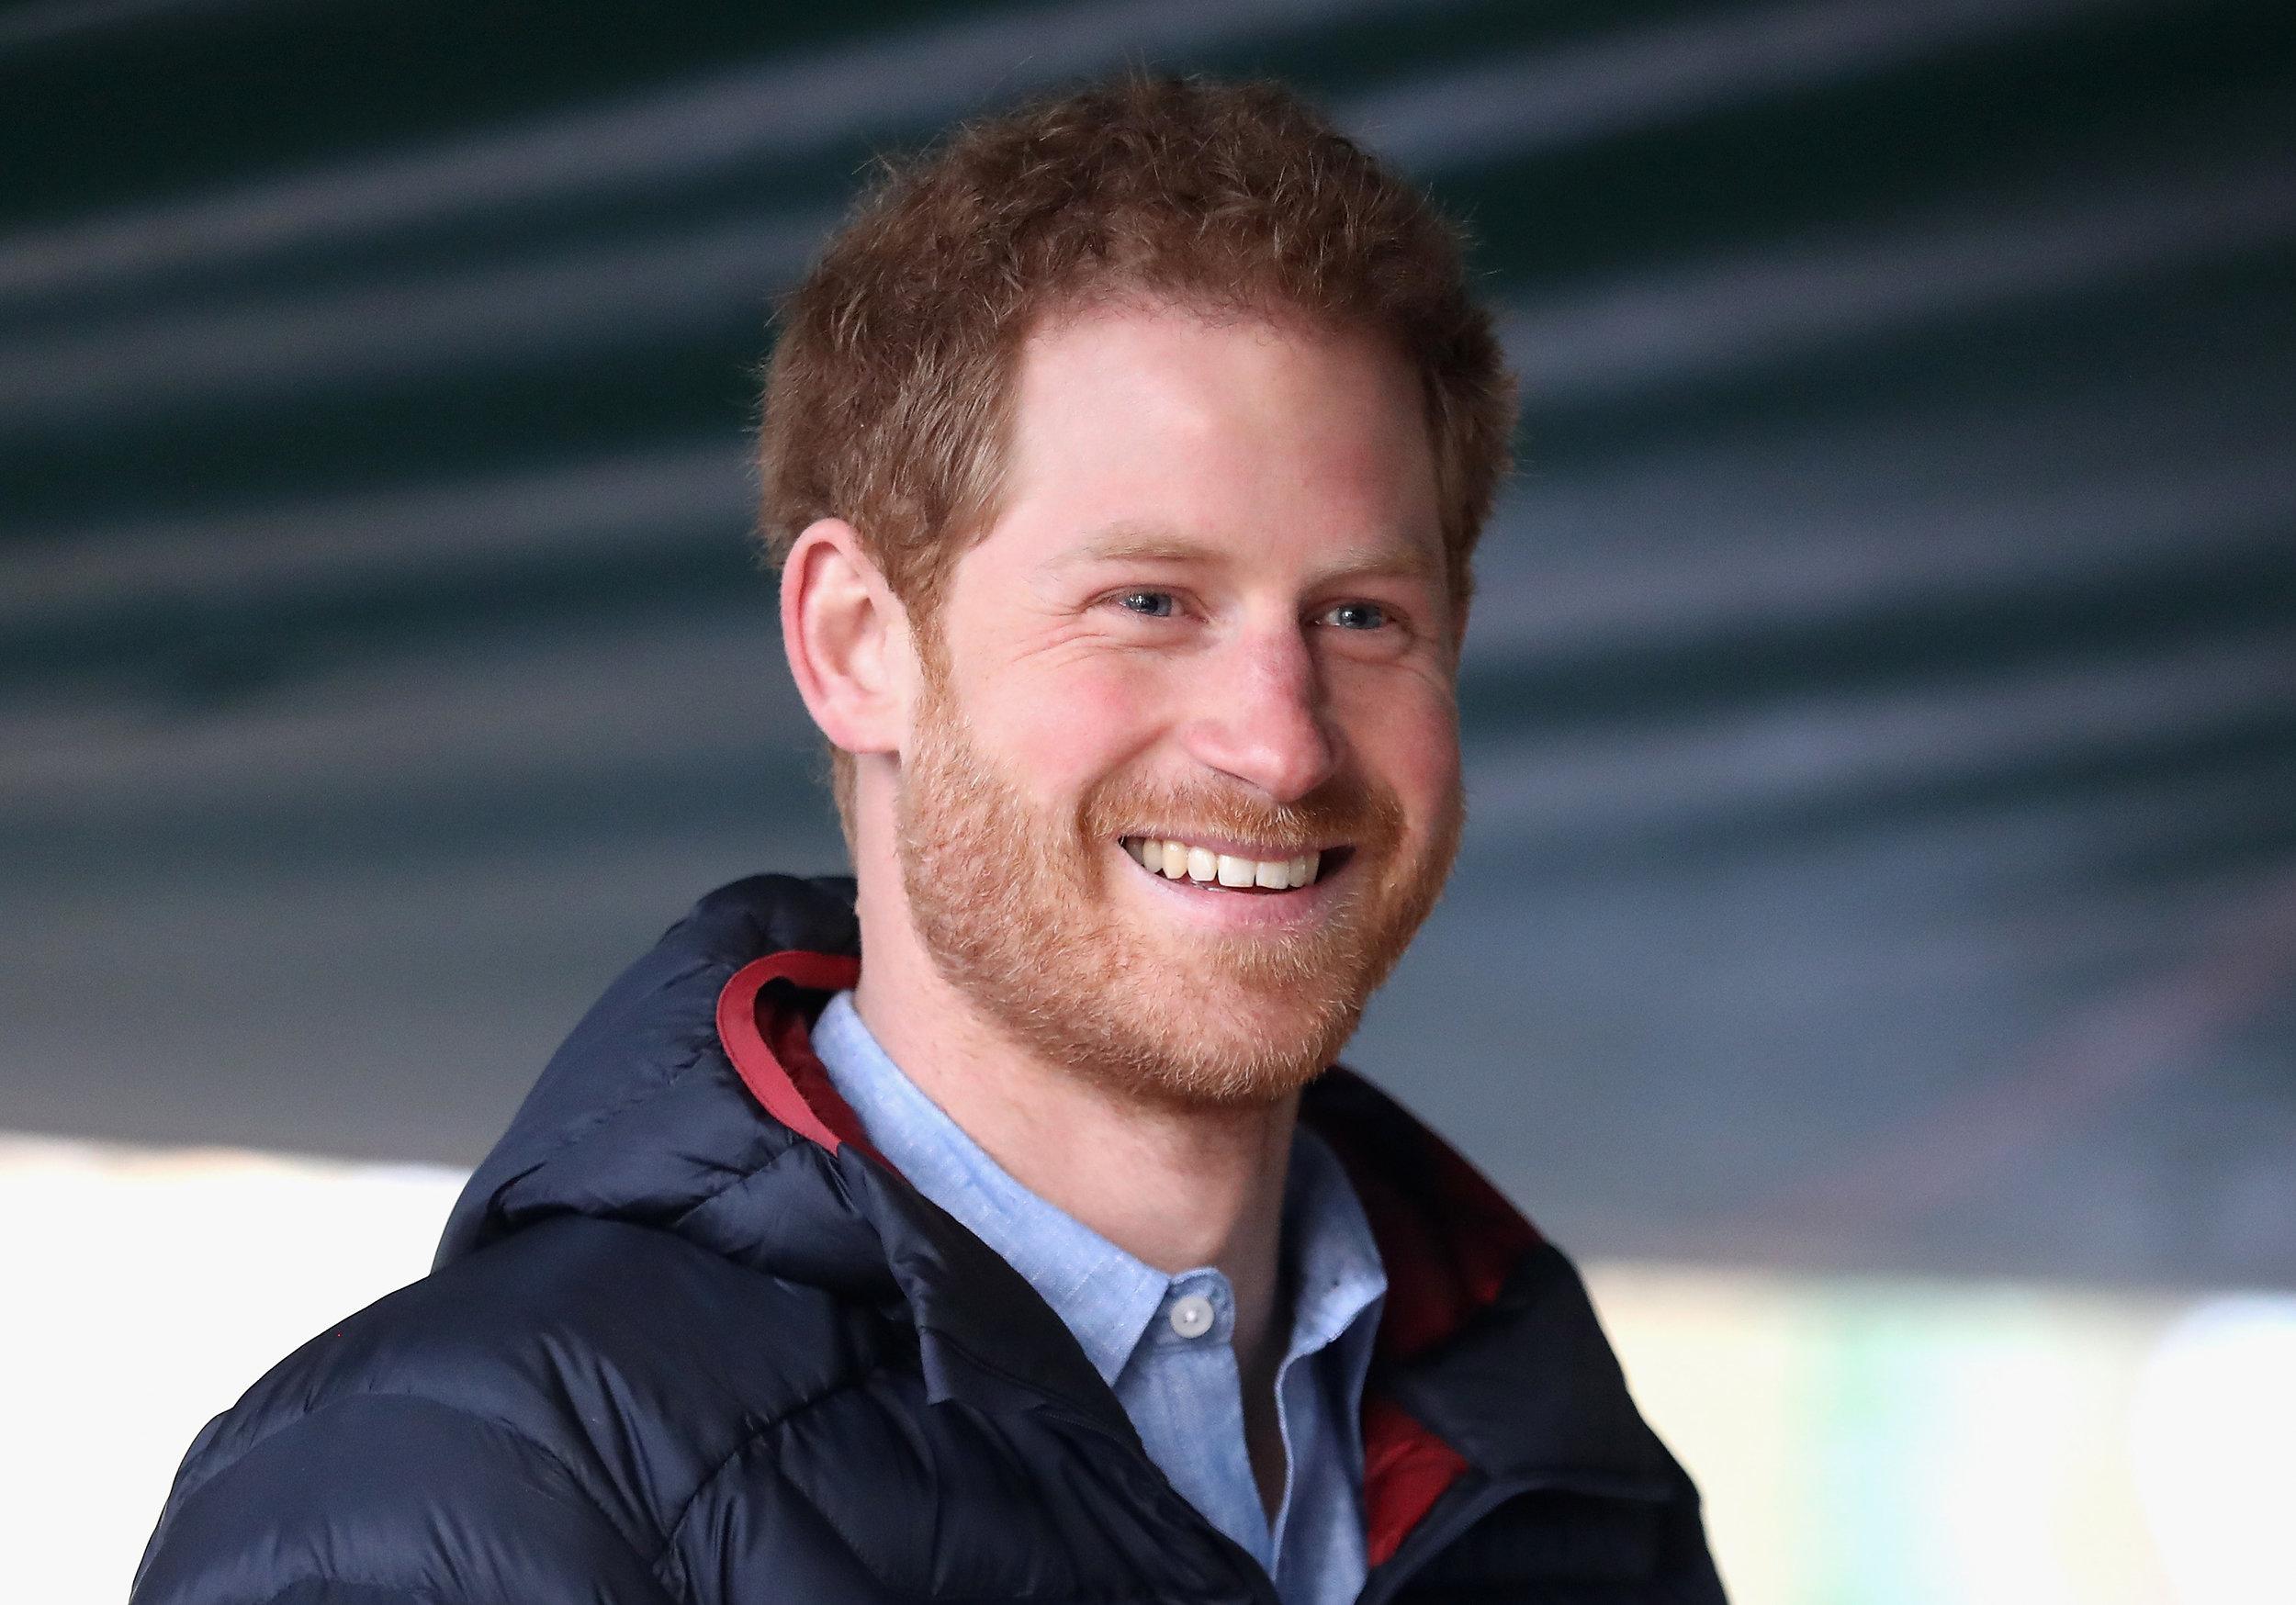 Prince Harry Kensington Palace London W8 4PU England   Foto: Getty Images